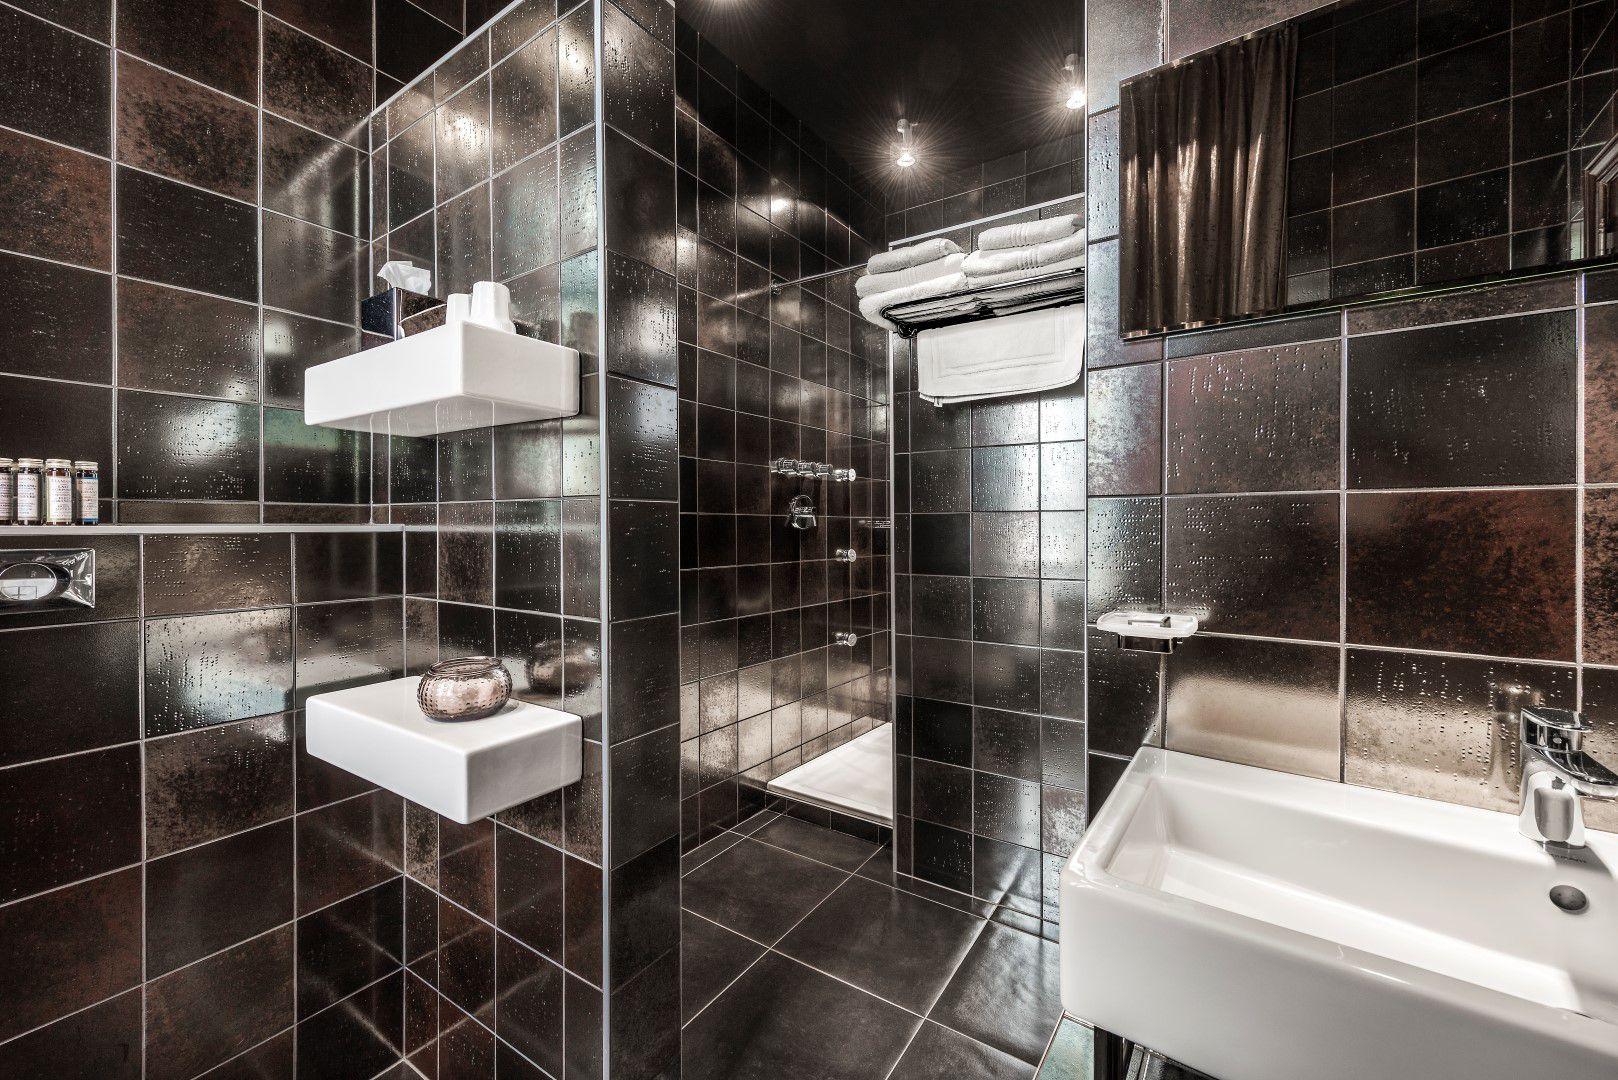 room-experiment-bathroom